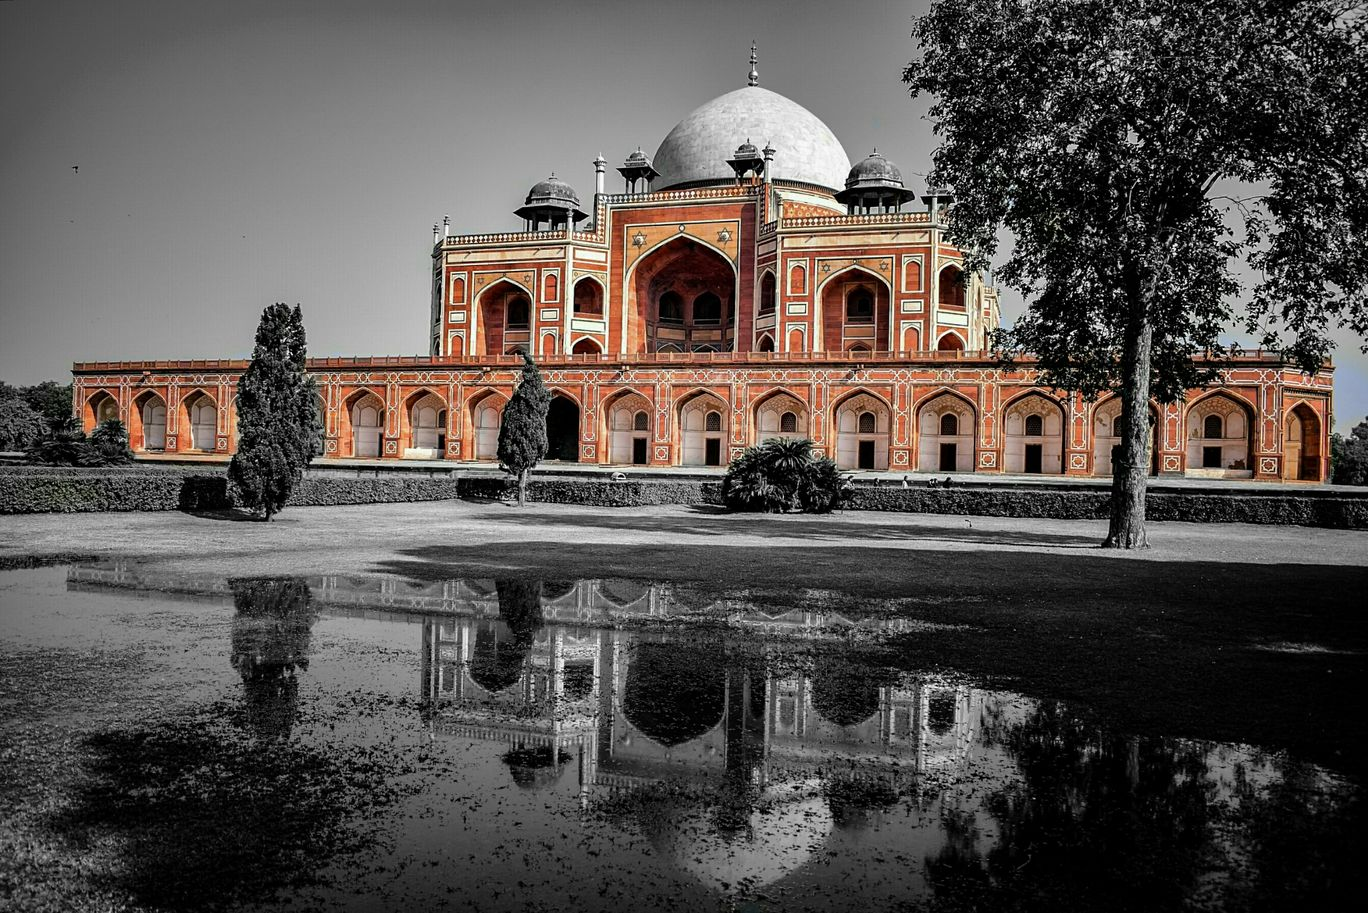 Photo of Humayun's Tomb By Arjun Ahuja